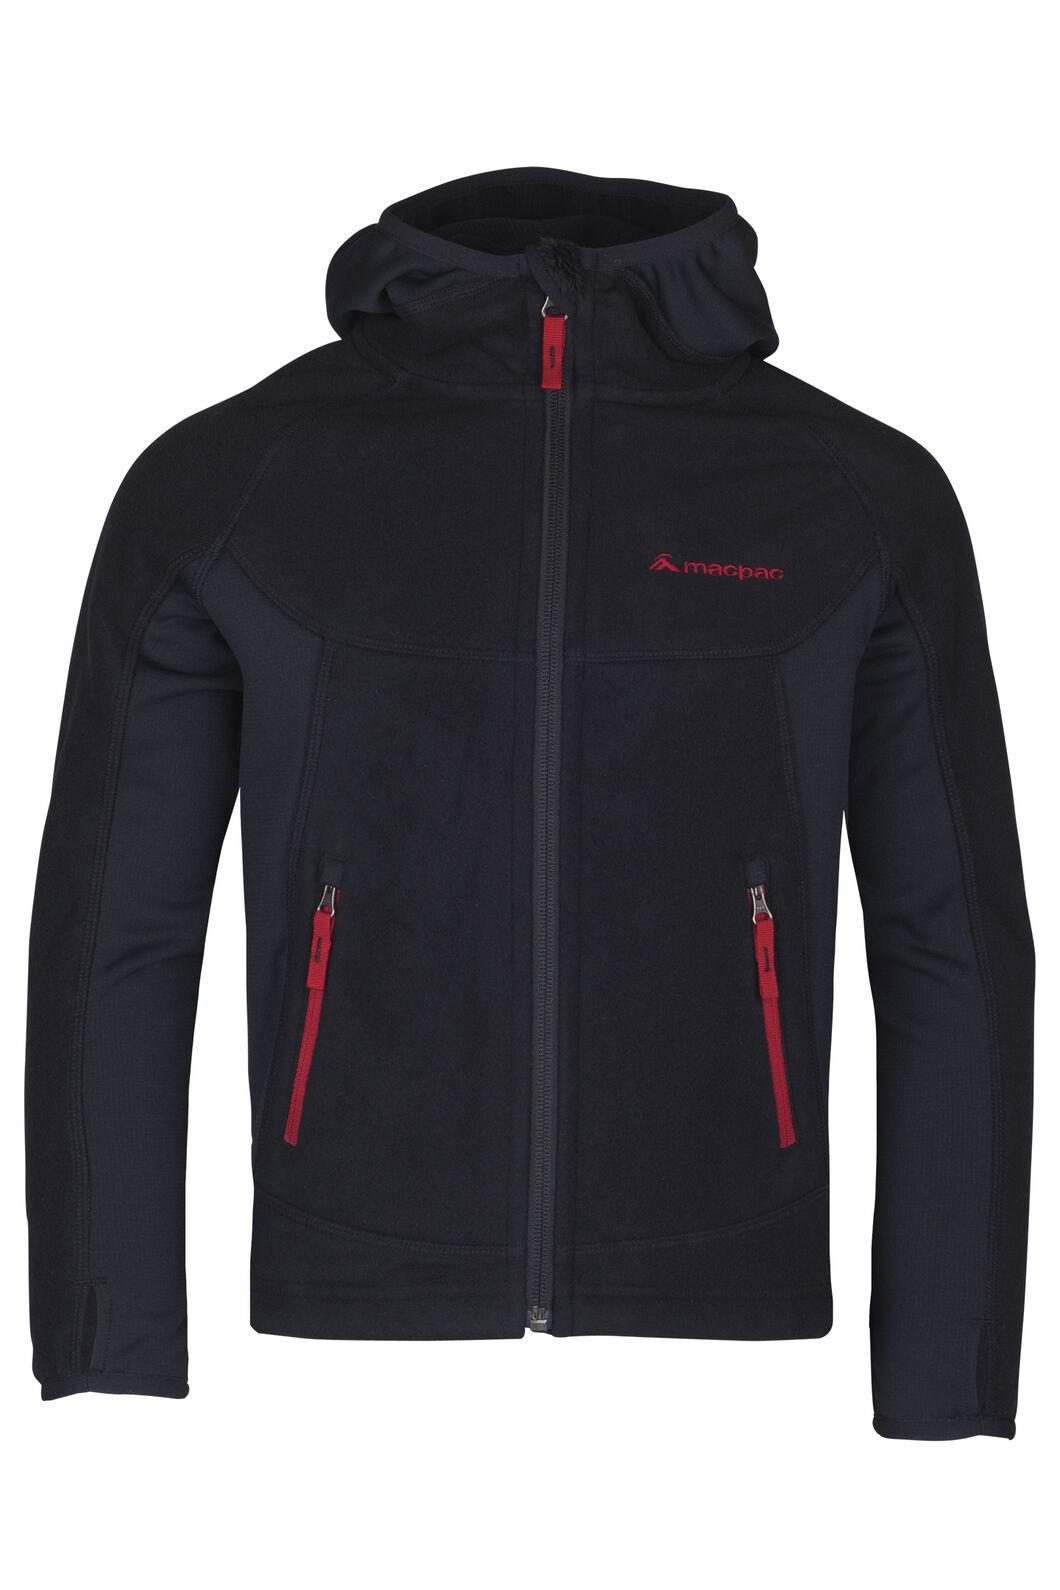 Mountain Hooded Pontetorto® Fleece Jacket - Kids', Black/Barbados, hi-res